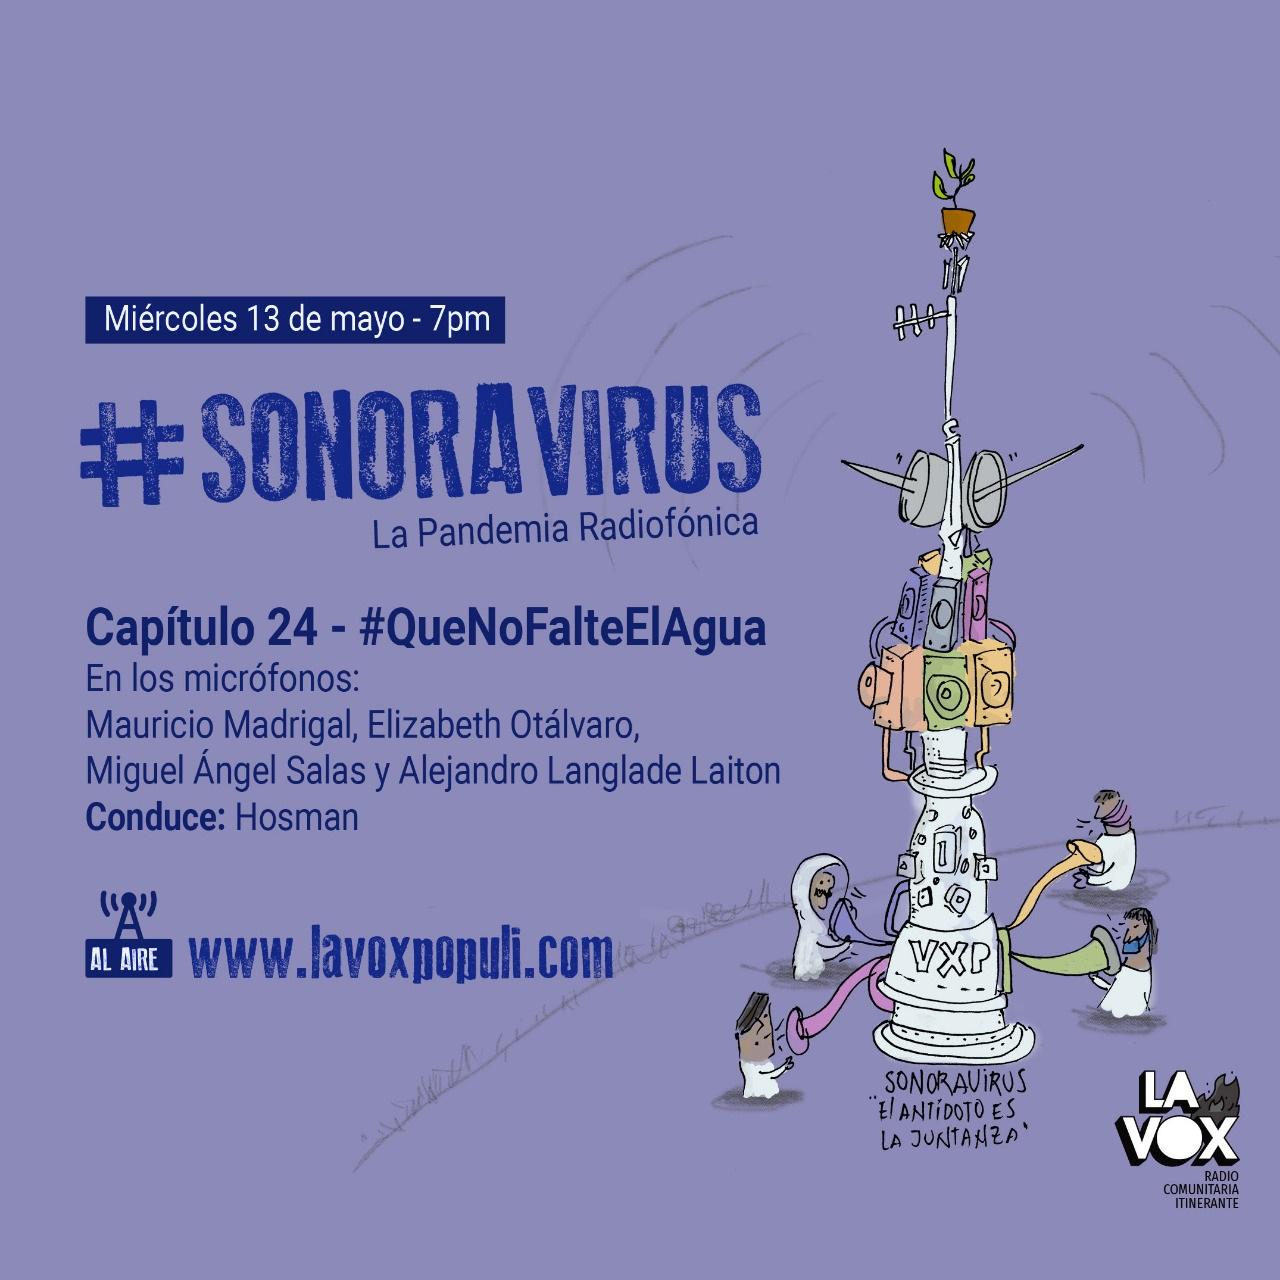 #SONORAVIRUS - La Pandemia Radiofónica. Capítulo 24: #QueNoFalteElAgua